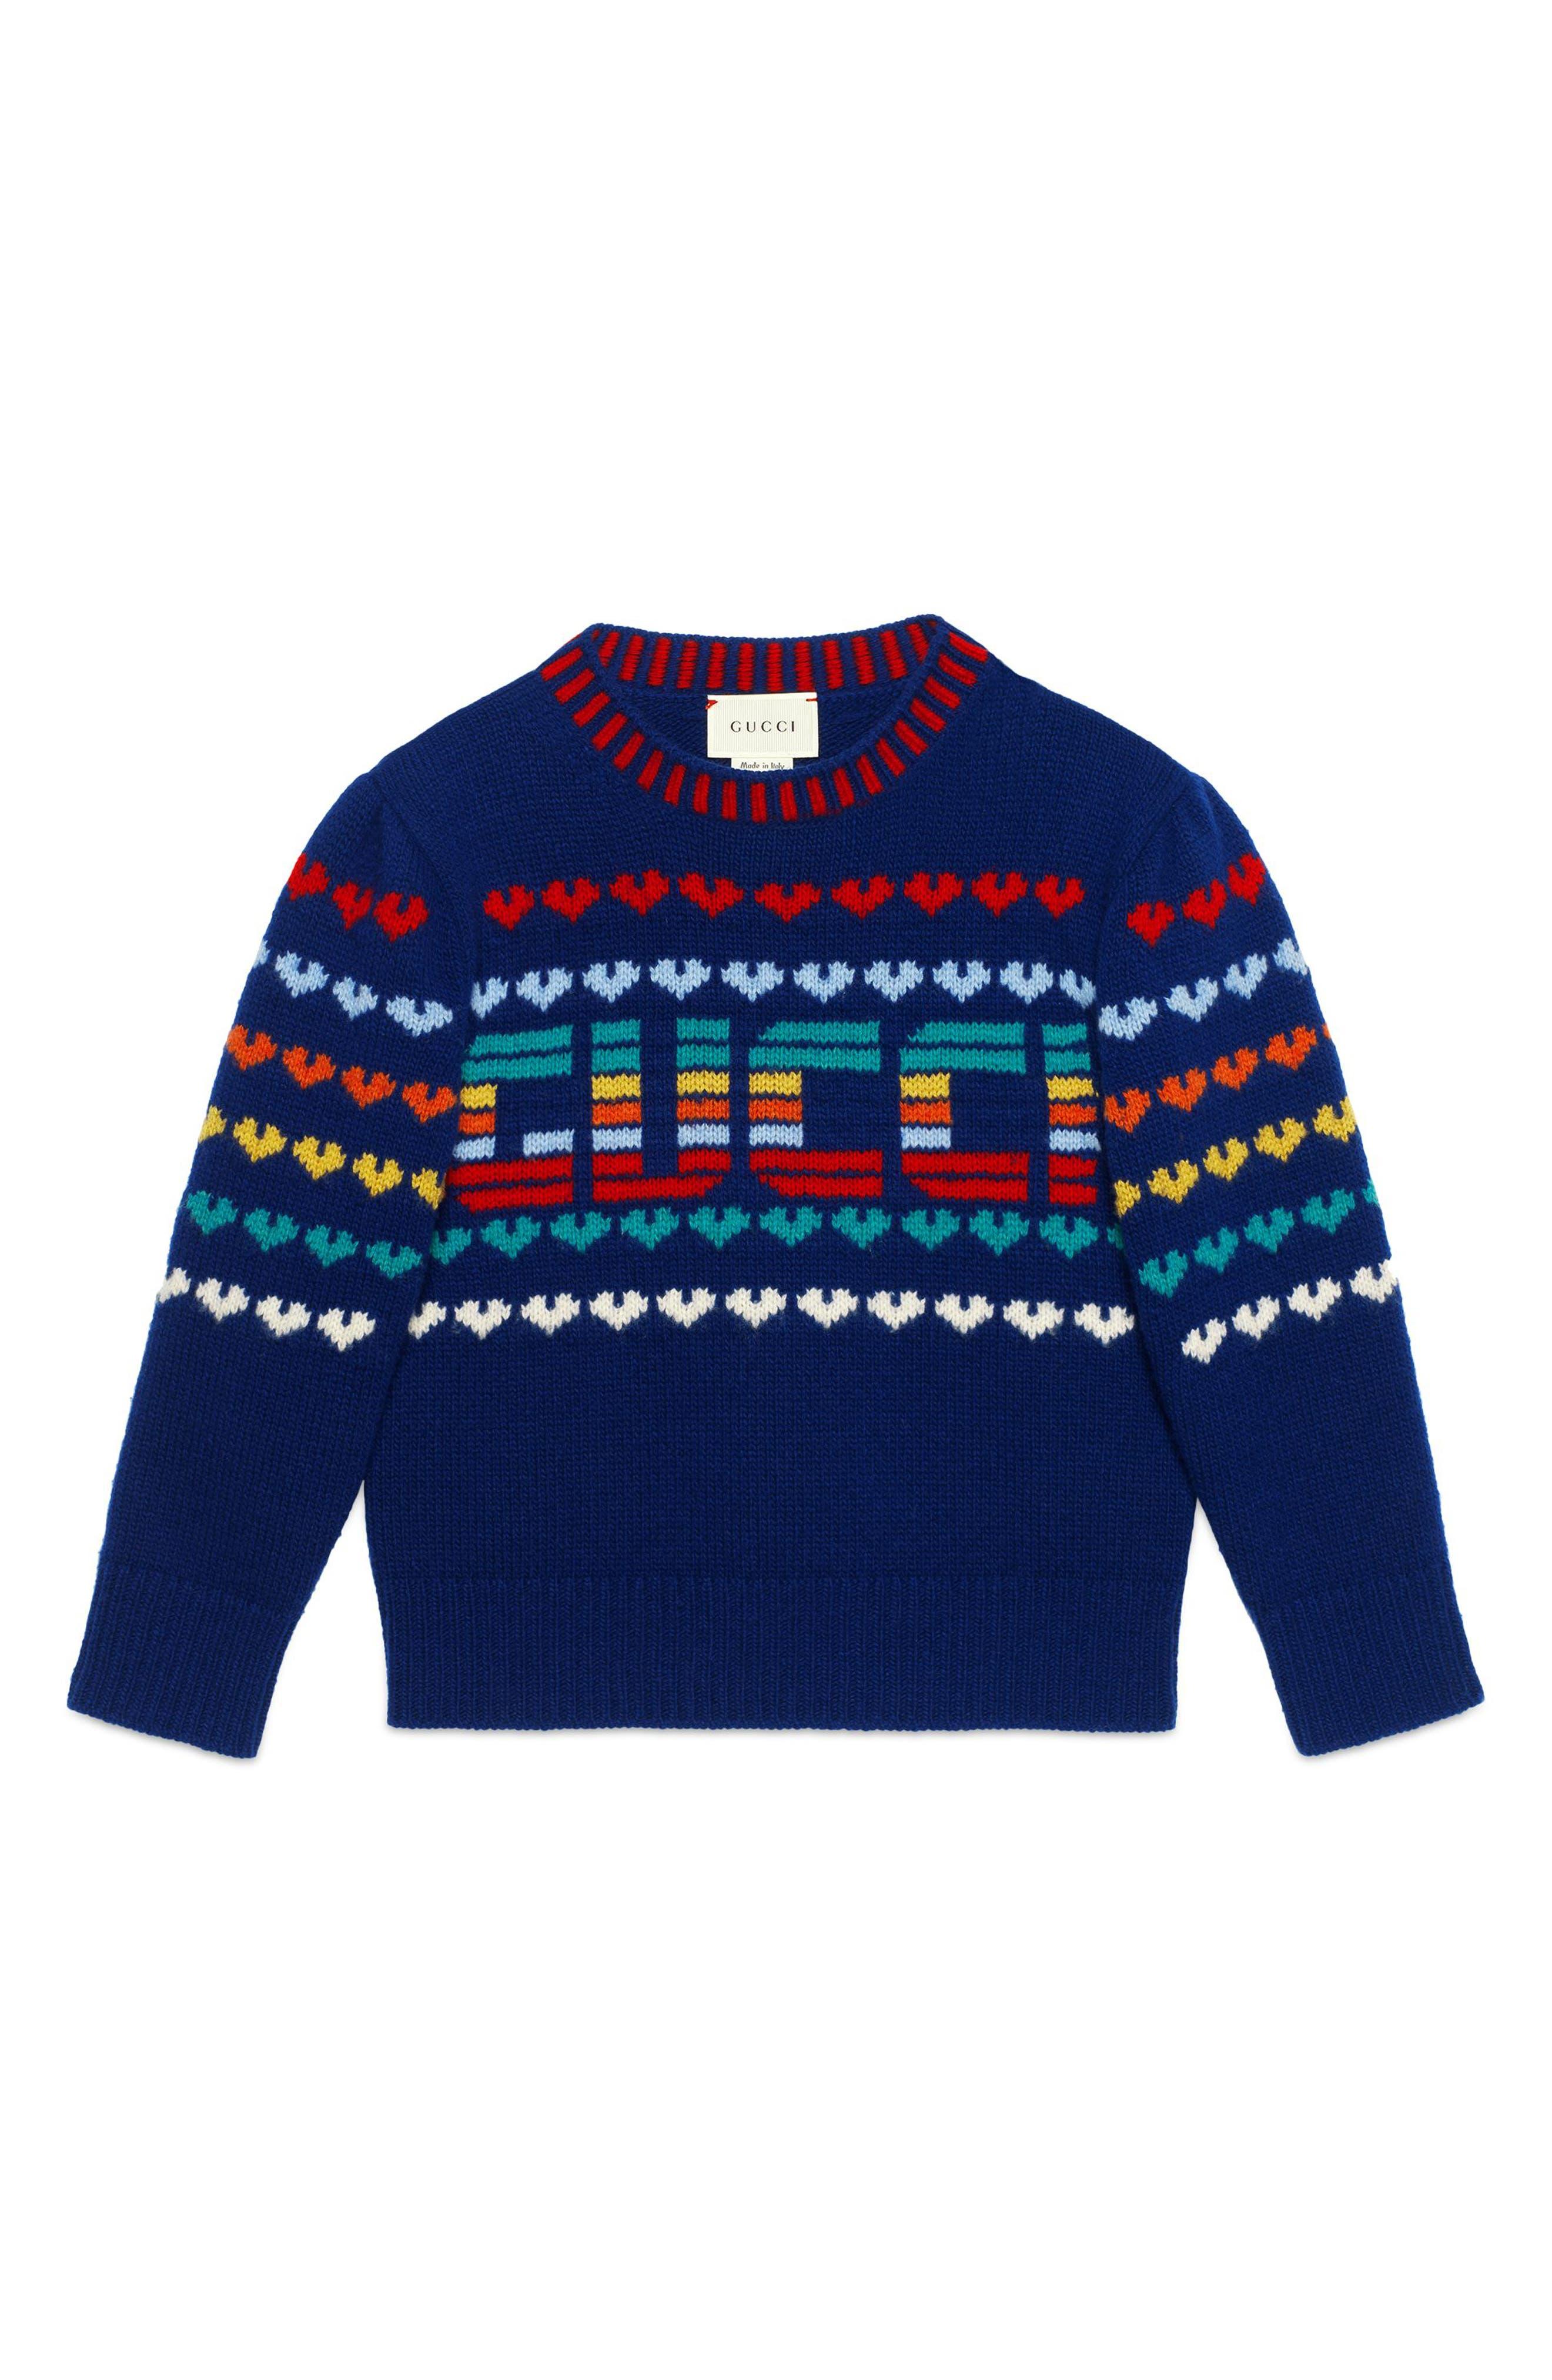 GUCCI Intarsia Sweater